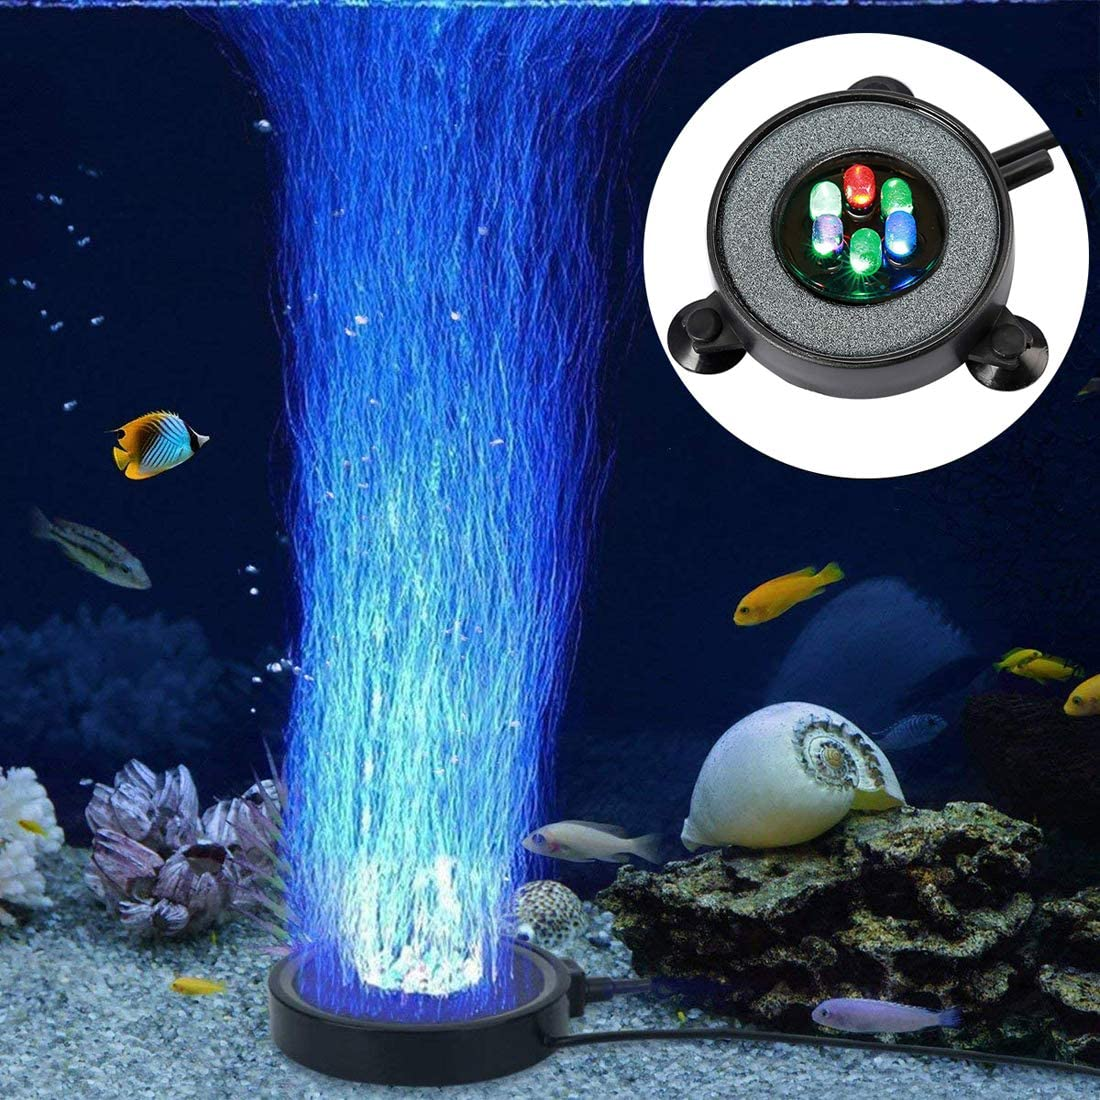 LED Aquarium Air Stones Fish Tank Bubbler Light Air Stone Diffuser Decor Lamp with Sucker Colorful Backgound Lighting (5.5cm/ 2.16inch)